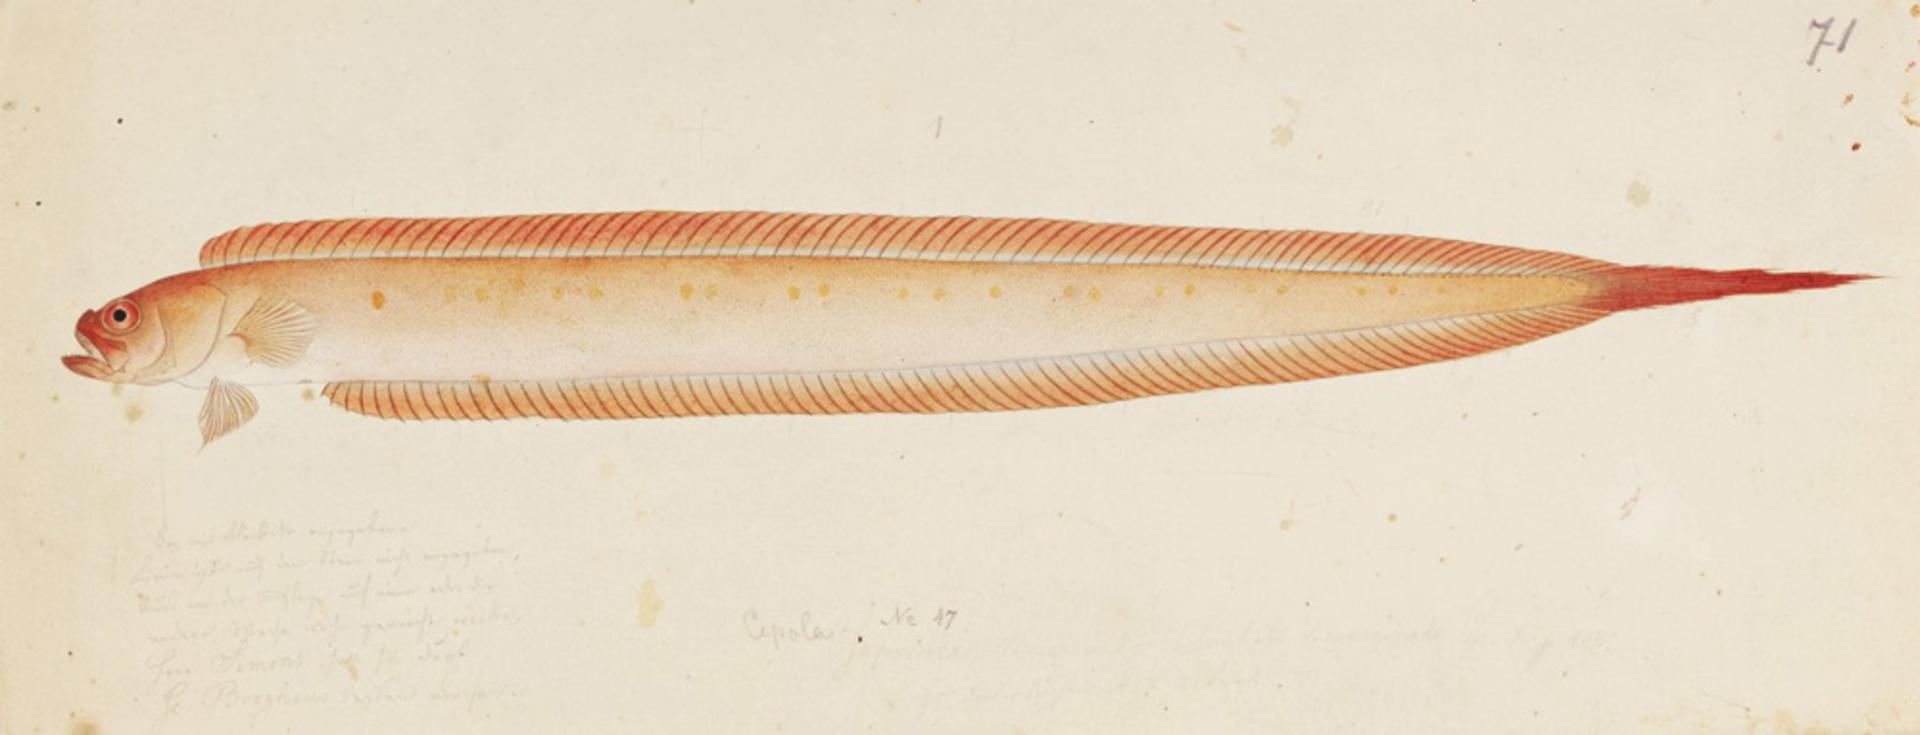 RMNH.ART.705 | Acanthocephala krusensterni